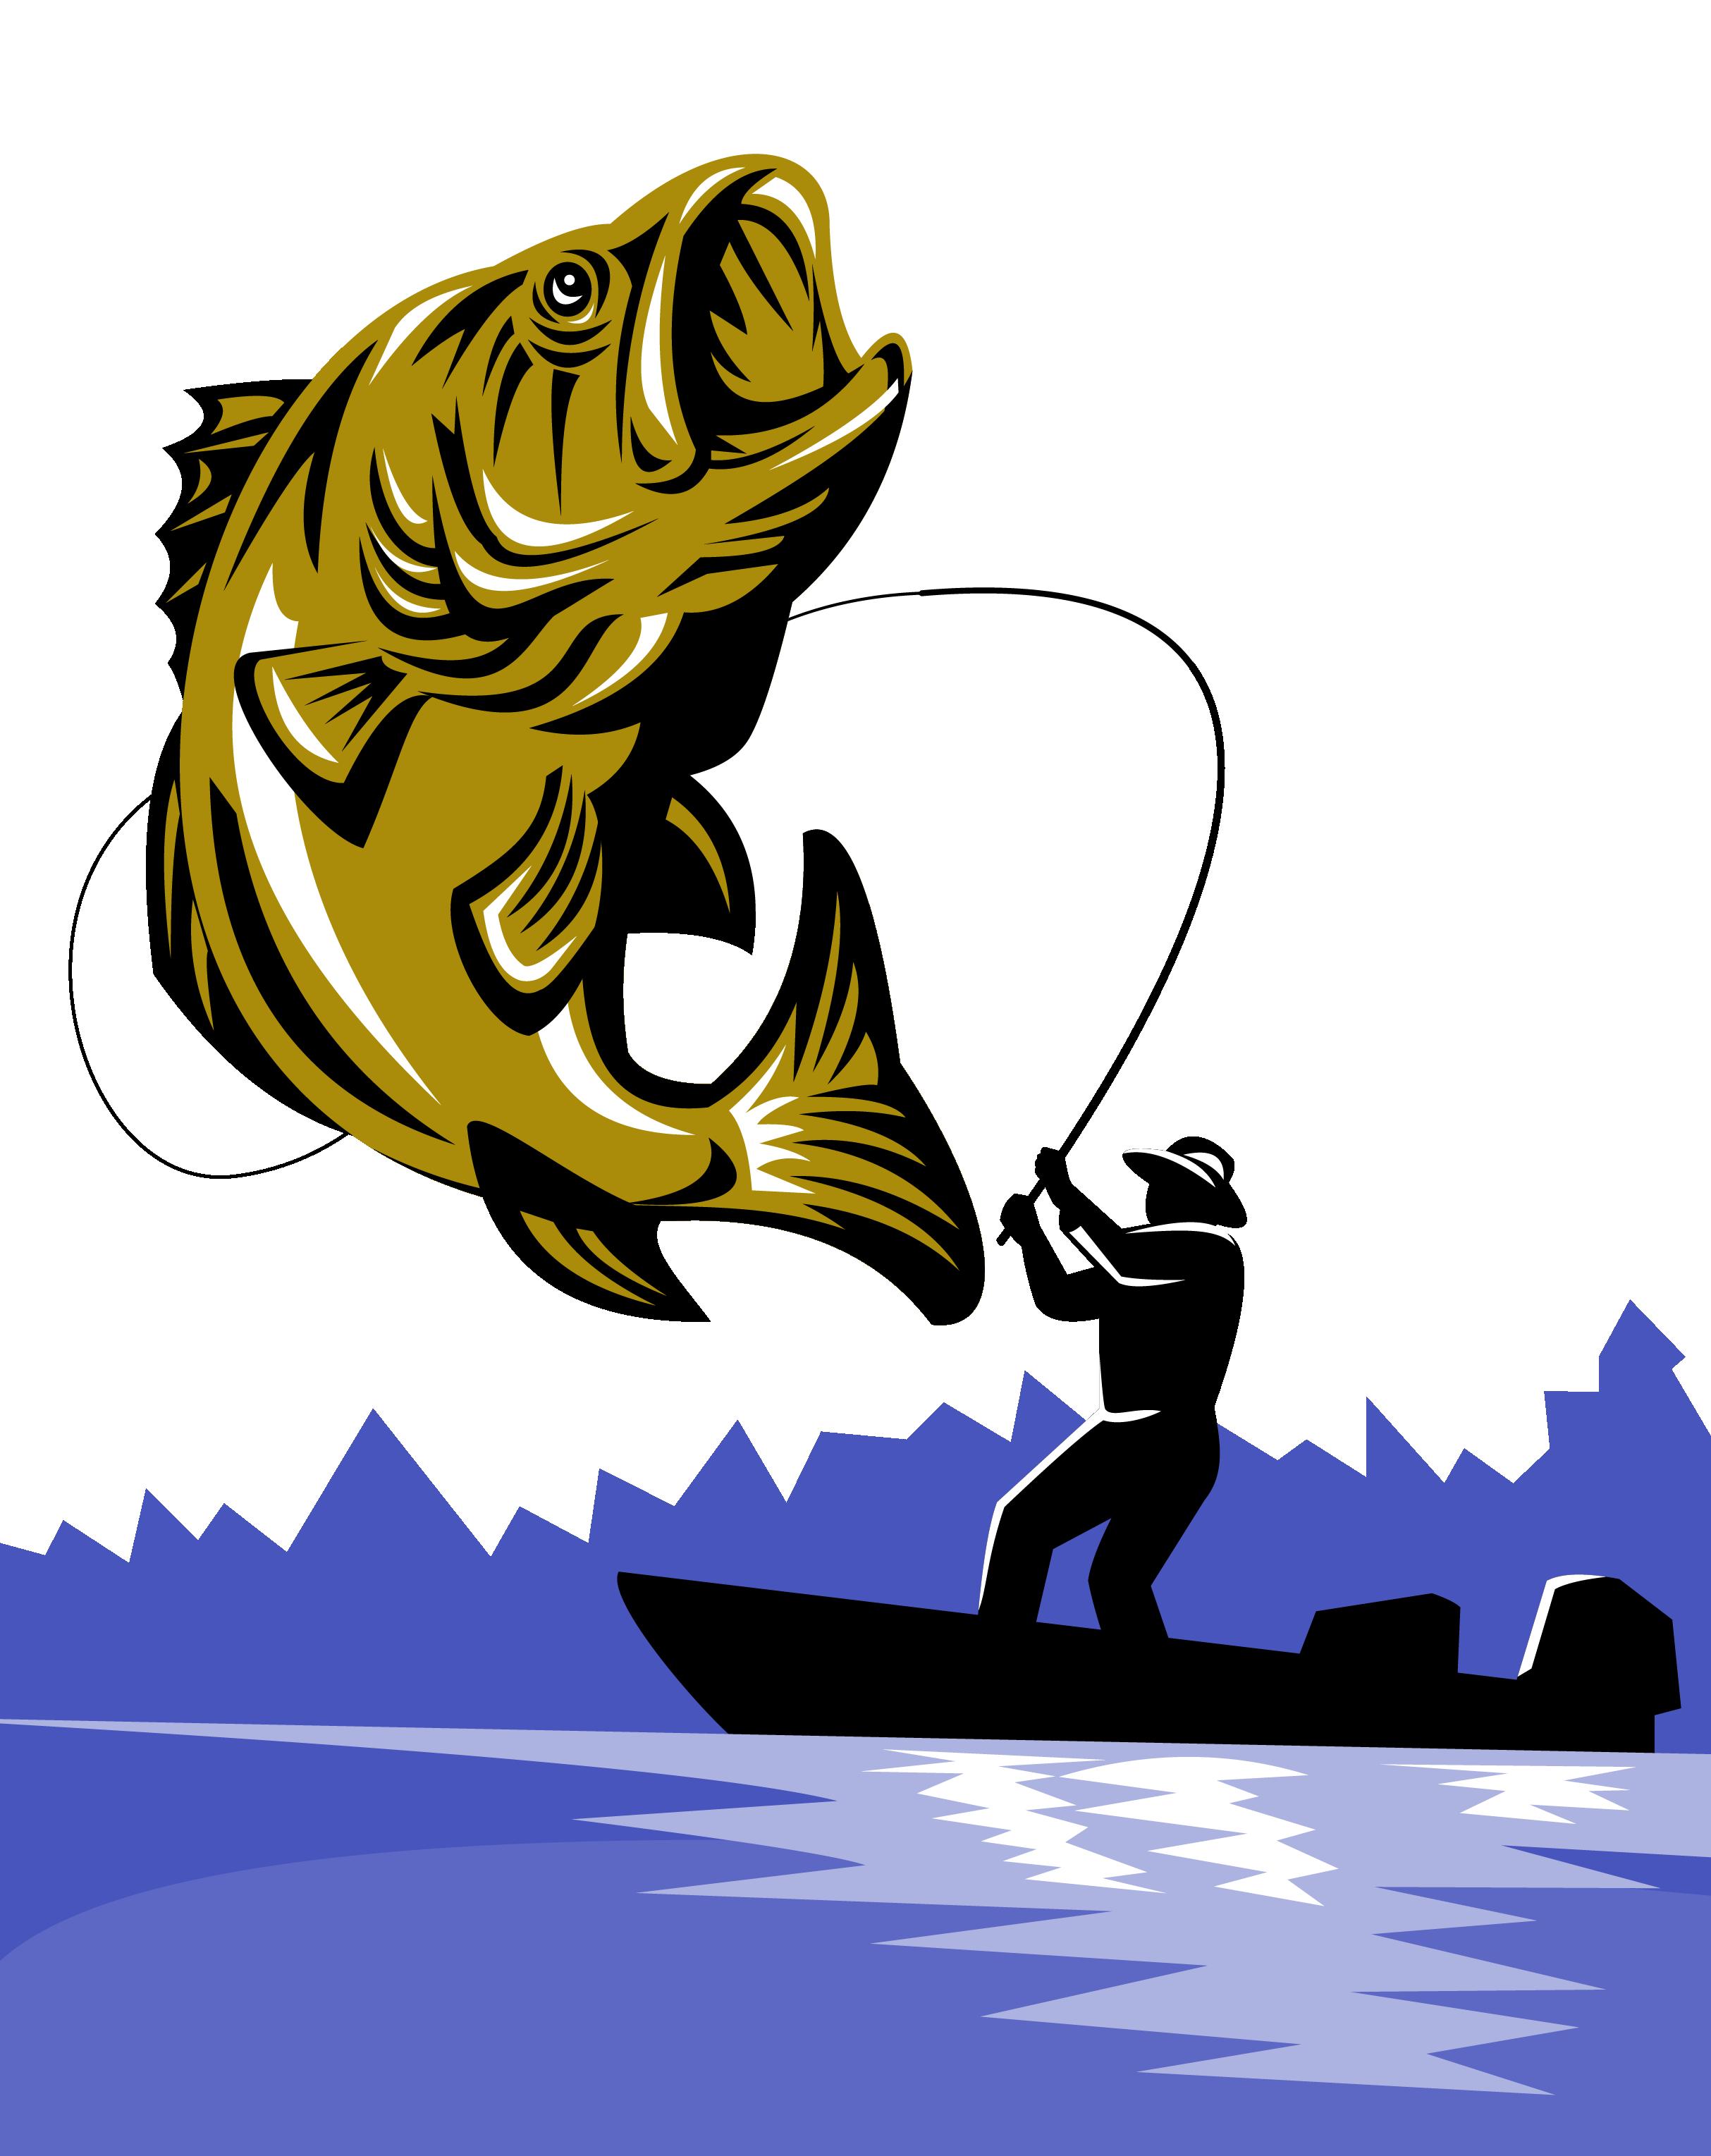 Fisherman clipart hook fish. Bass fishing rod fly